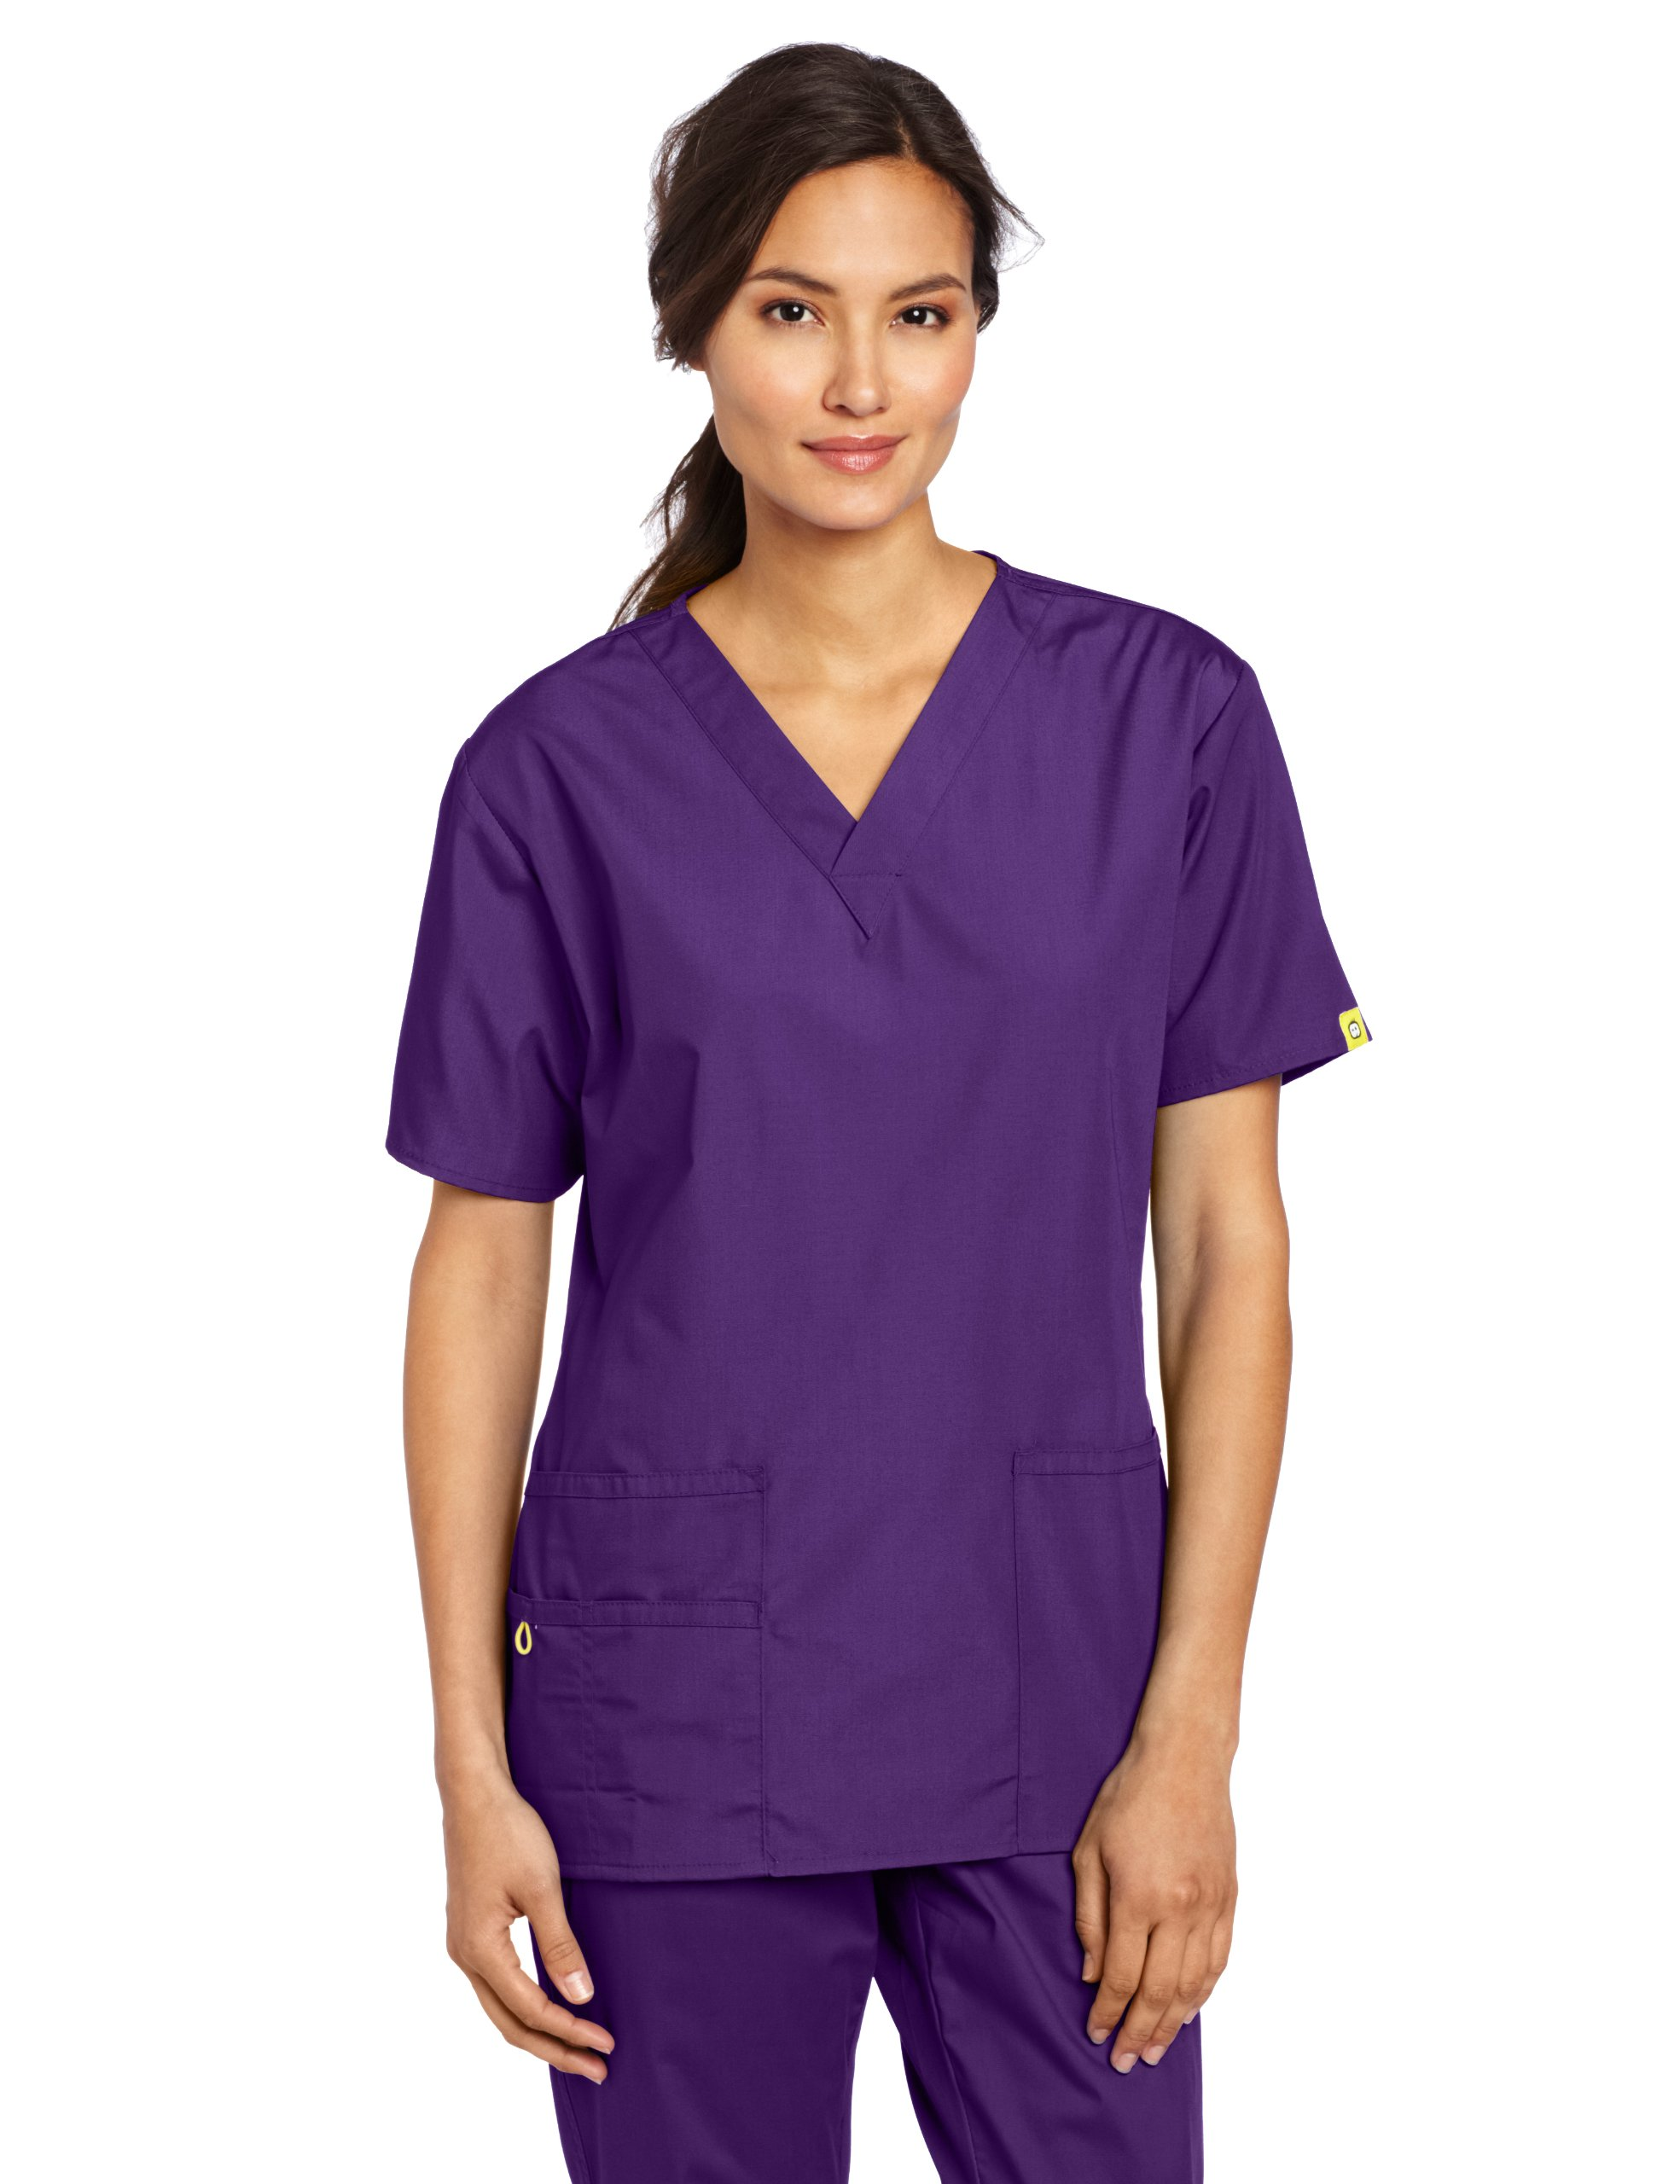 WonderWink Women's Scrubs Bravo 5 Pocket V-Neck Top, Grape, 2X-Large